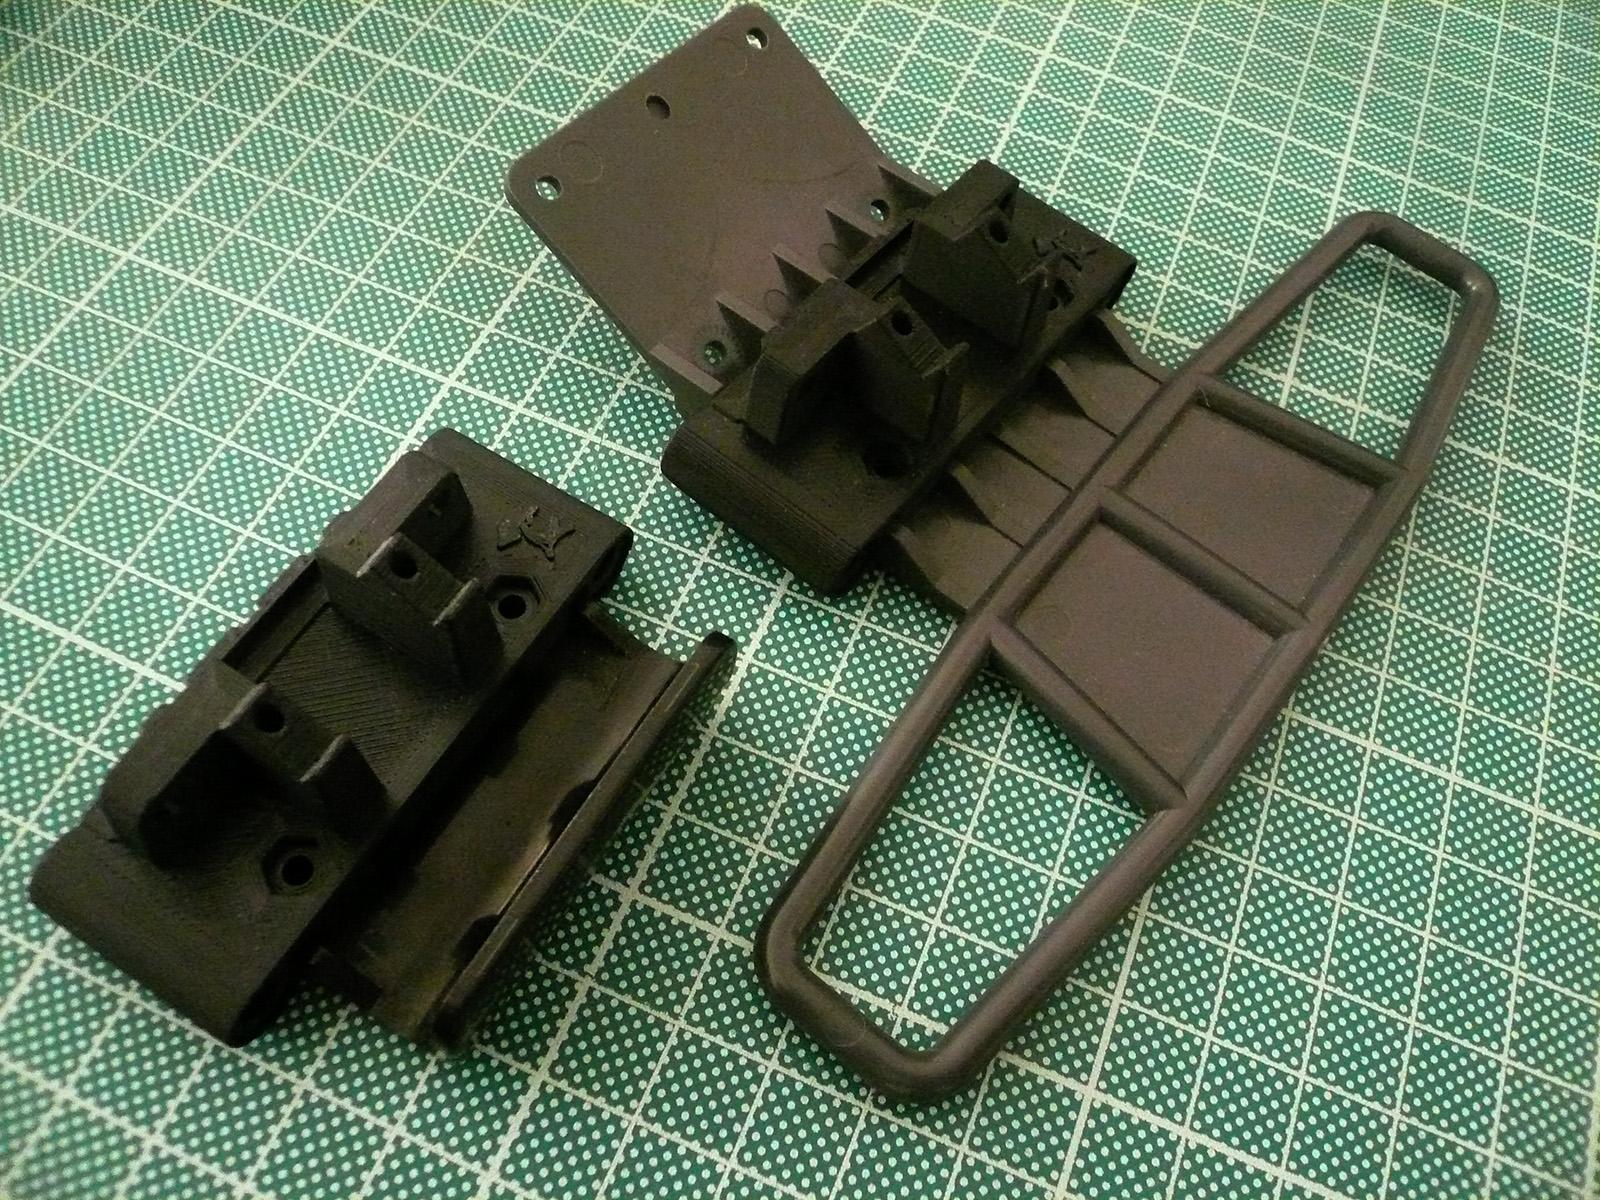 tamiya wrenchdog dyna storm dyna blaster tr-15t db211x prototype bulkhead d5 3d print pa12